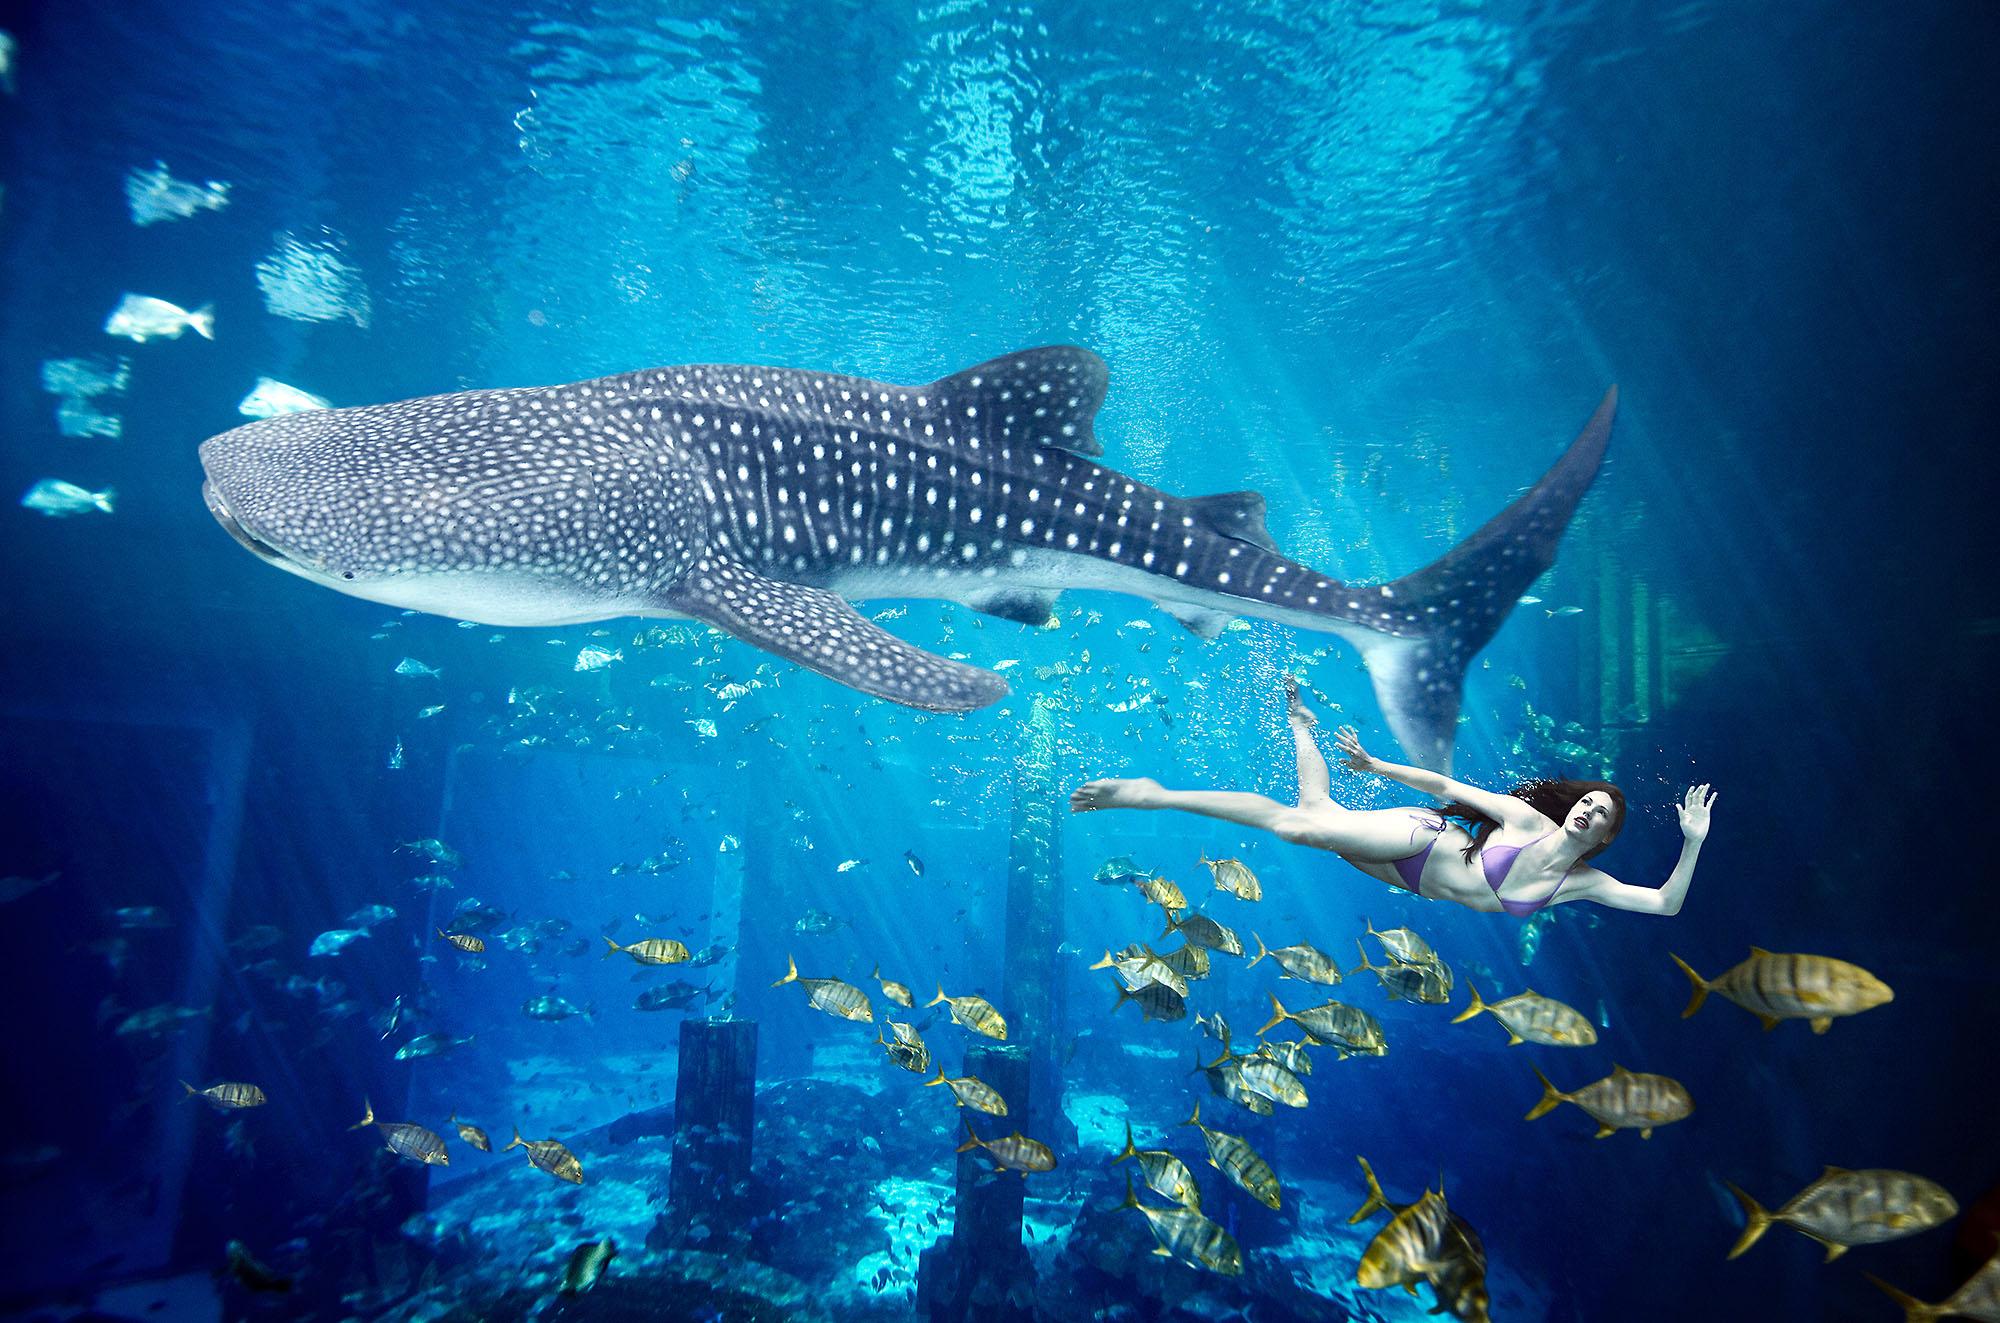 Karan Kapoor girl swimming with fish